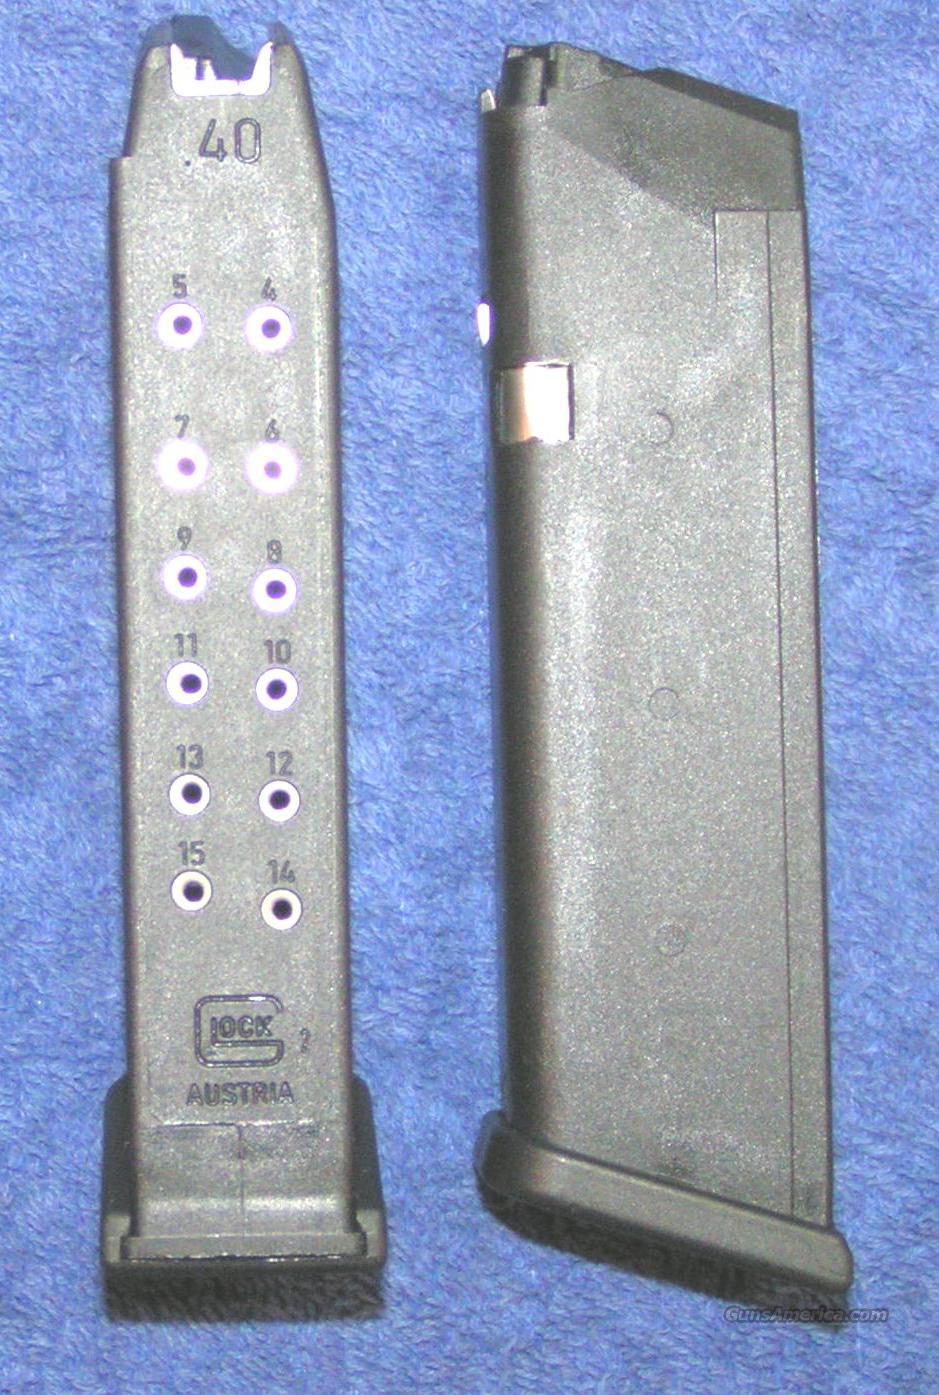 2 Glock 22 mags. 40S&W 15 round factory Glock Gen 4 $27 each  Non-Guns > Magazines & Clips